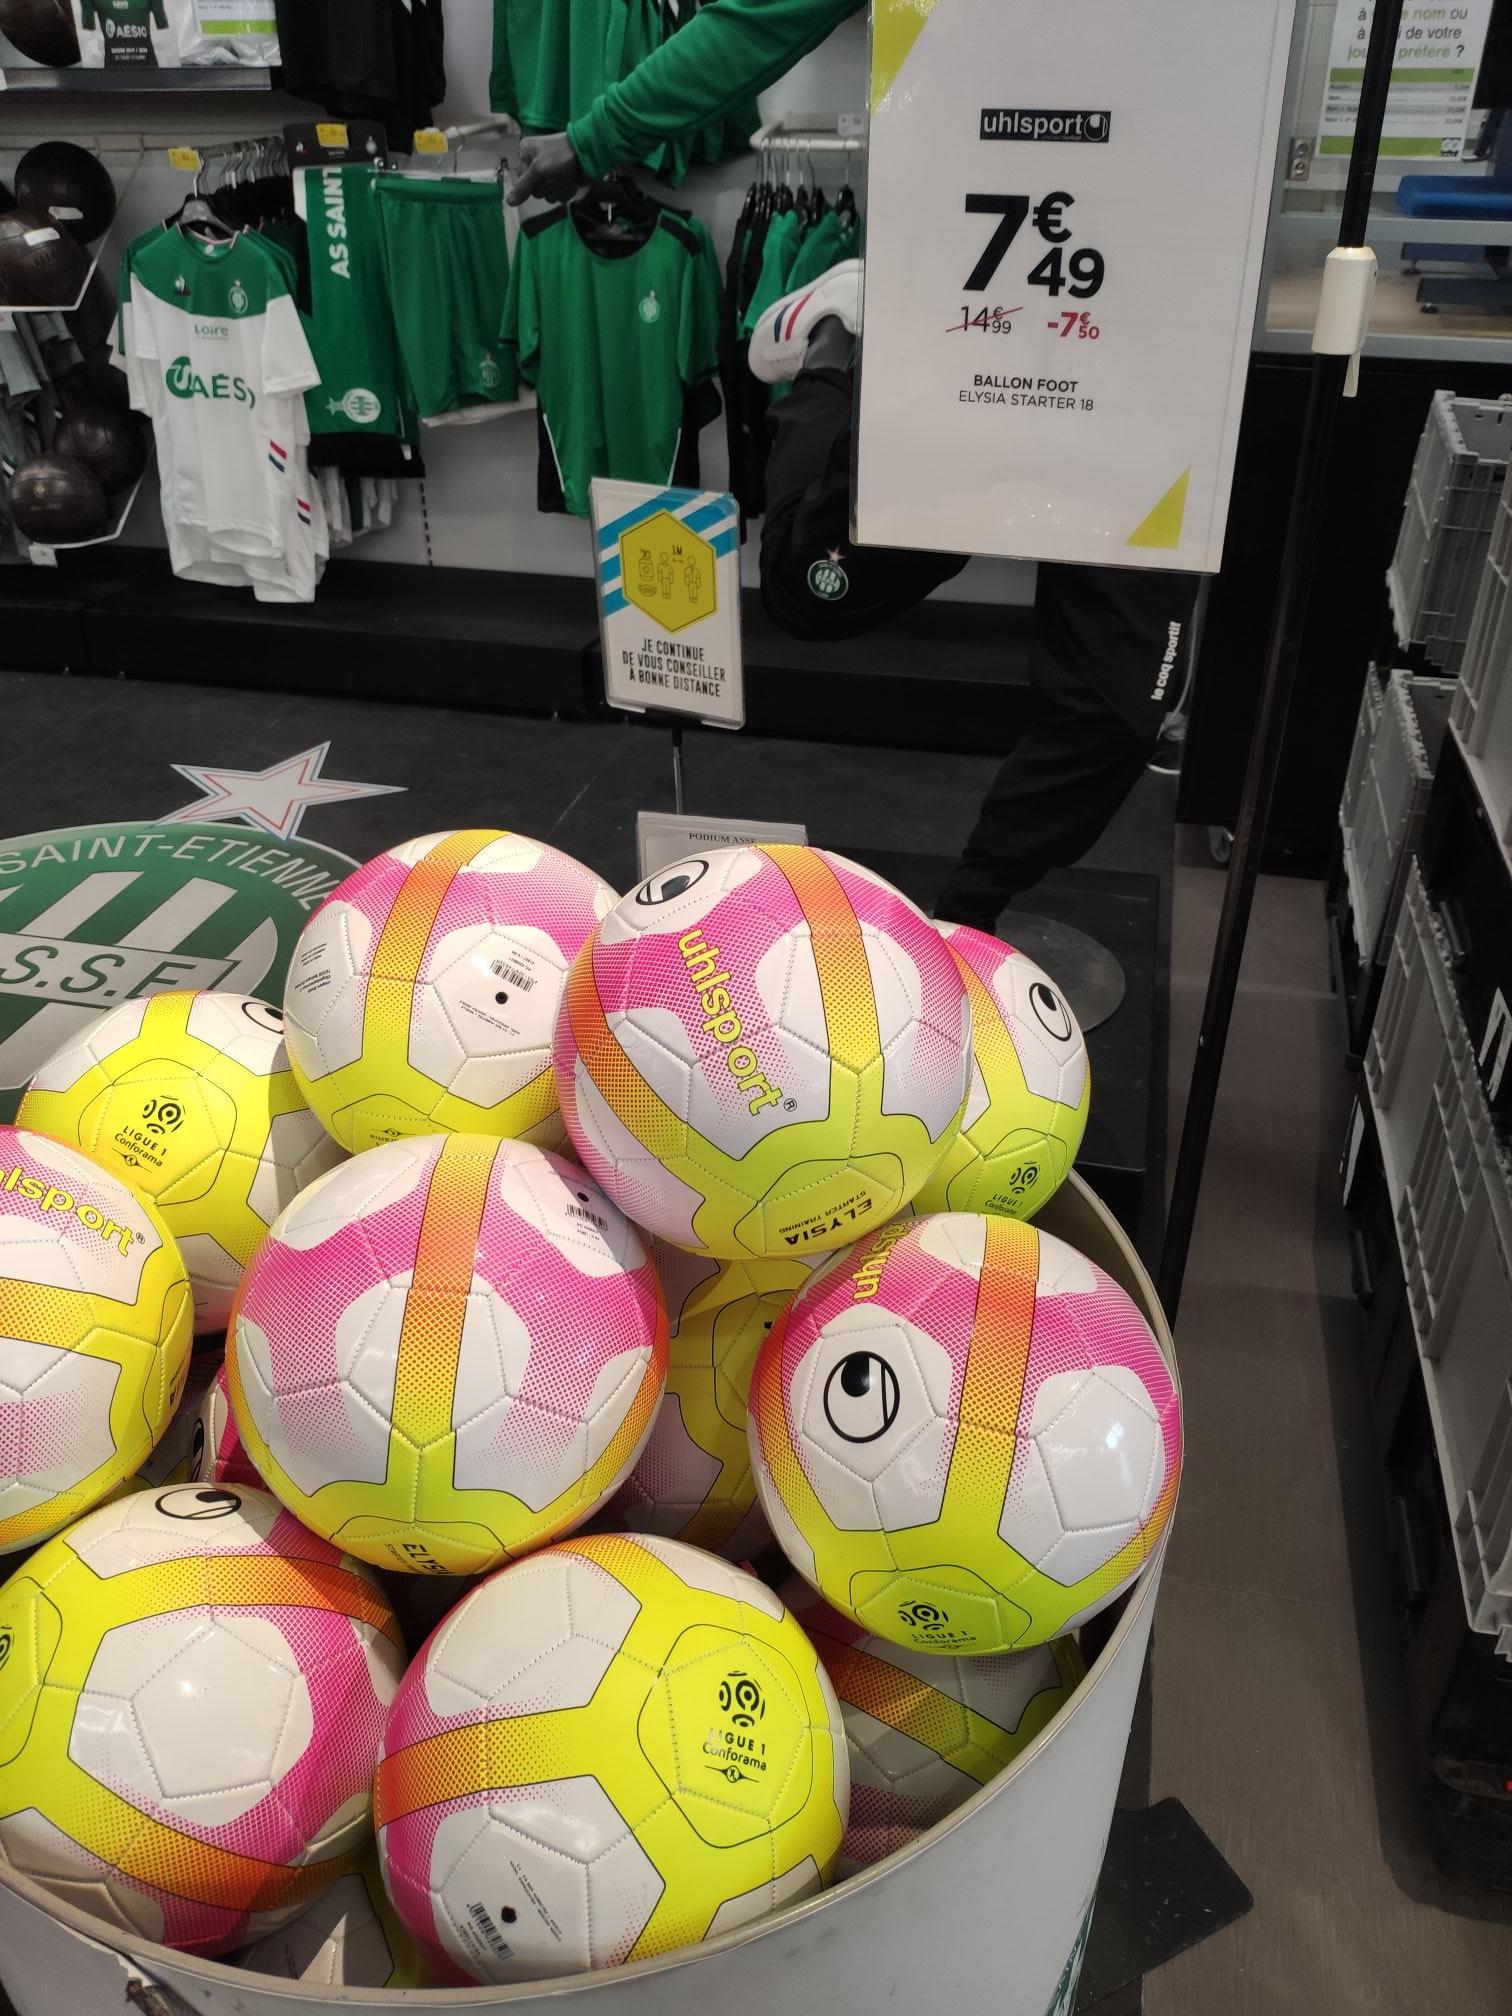 Ballon de Football Uhlsport Ligue 1 Elysia Starter 19 - Saint Etienne (42)